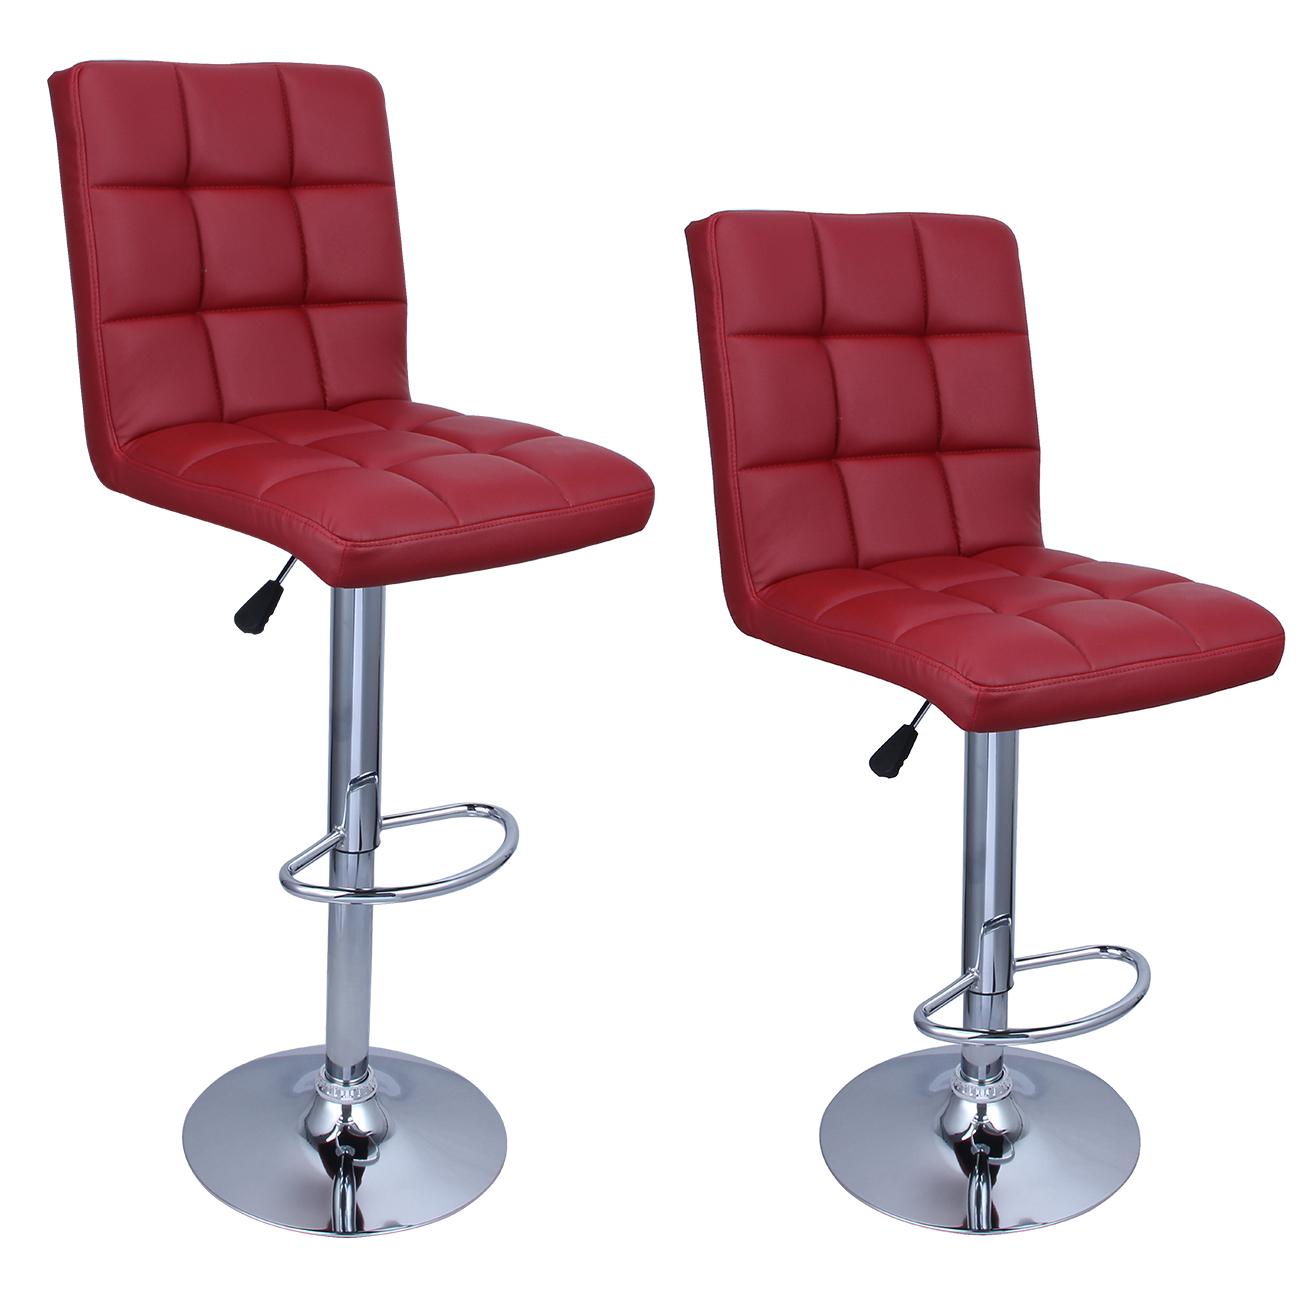 hydraulic bar stools. Belleze Swivel Leather Adjustable Hydraulic Bar Stool Merlot Red, Set Of 2 Stools A